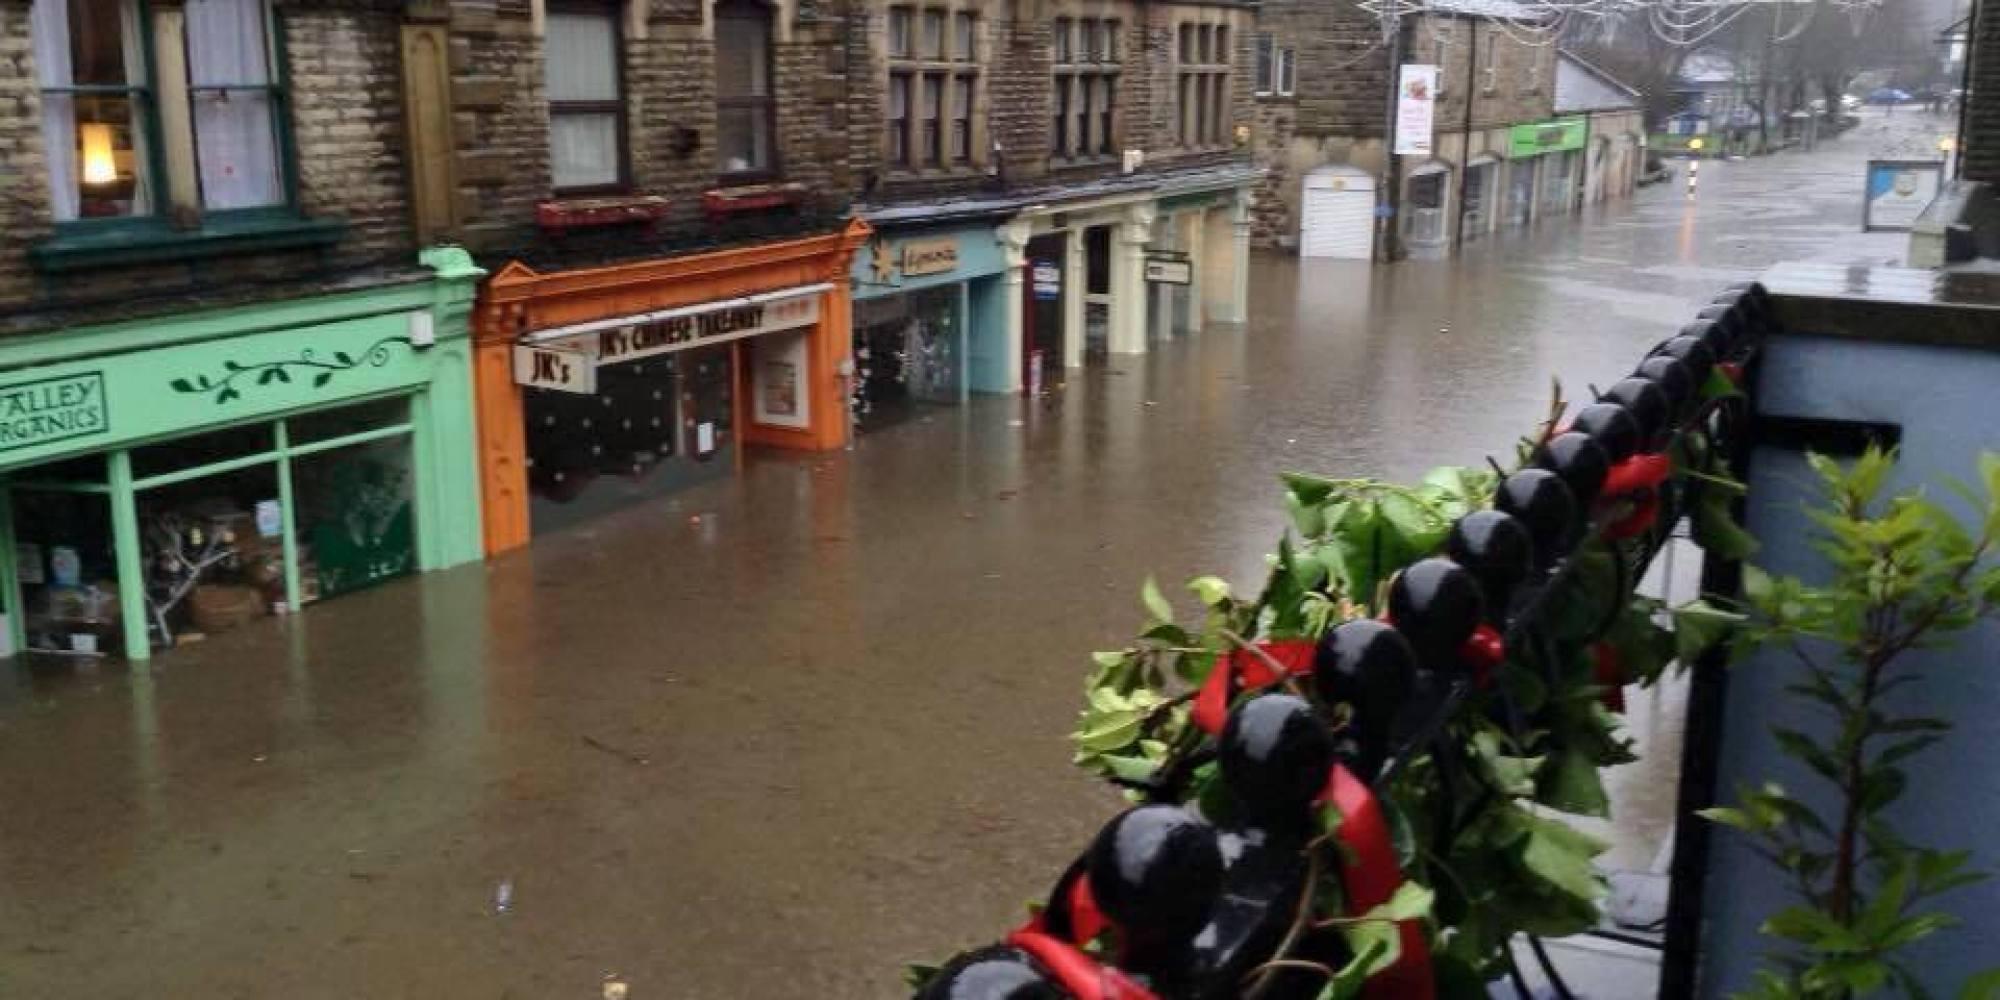 Flooding In Hebden Bridge, Yorkshire As Devastation Sweeps ...